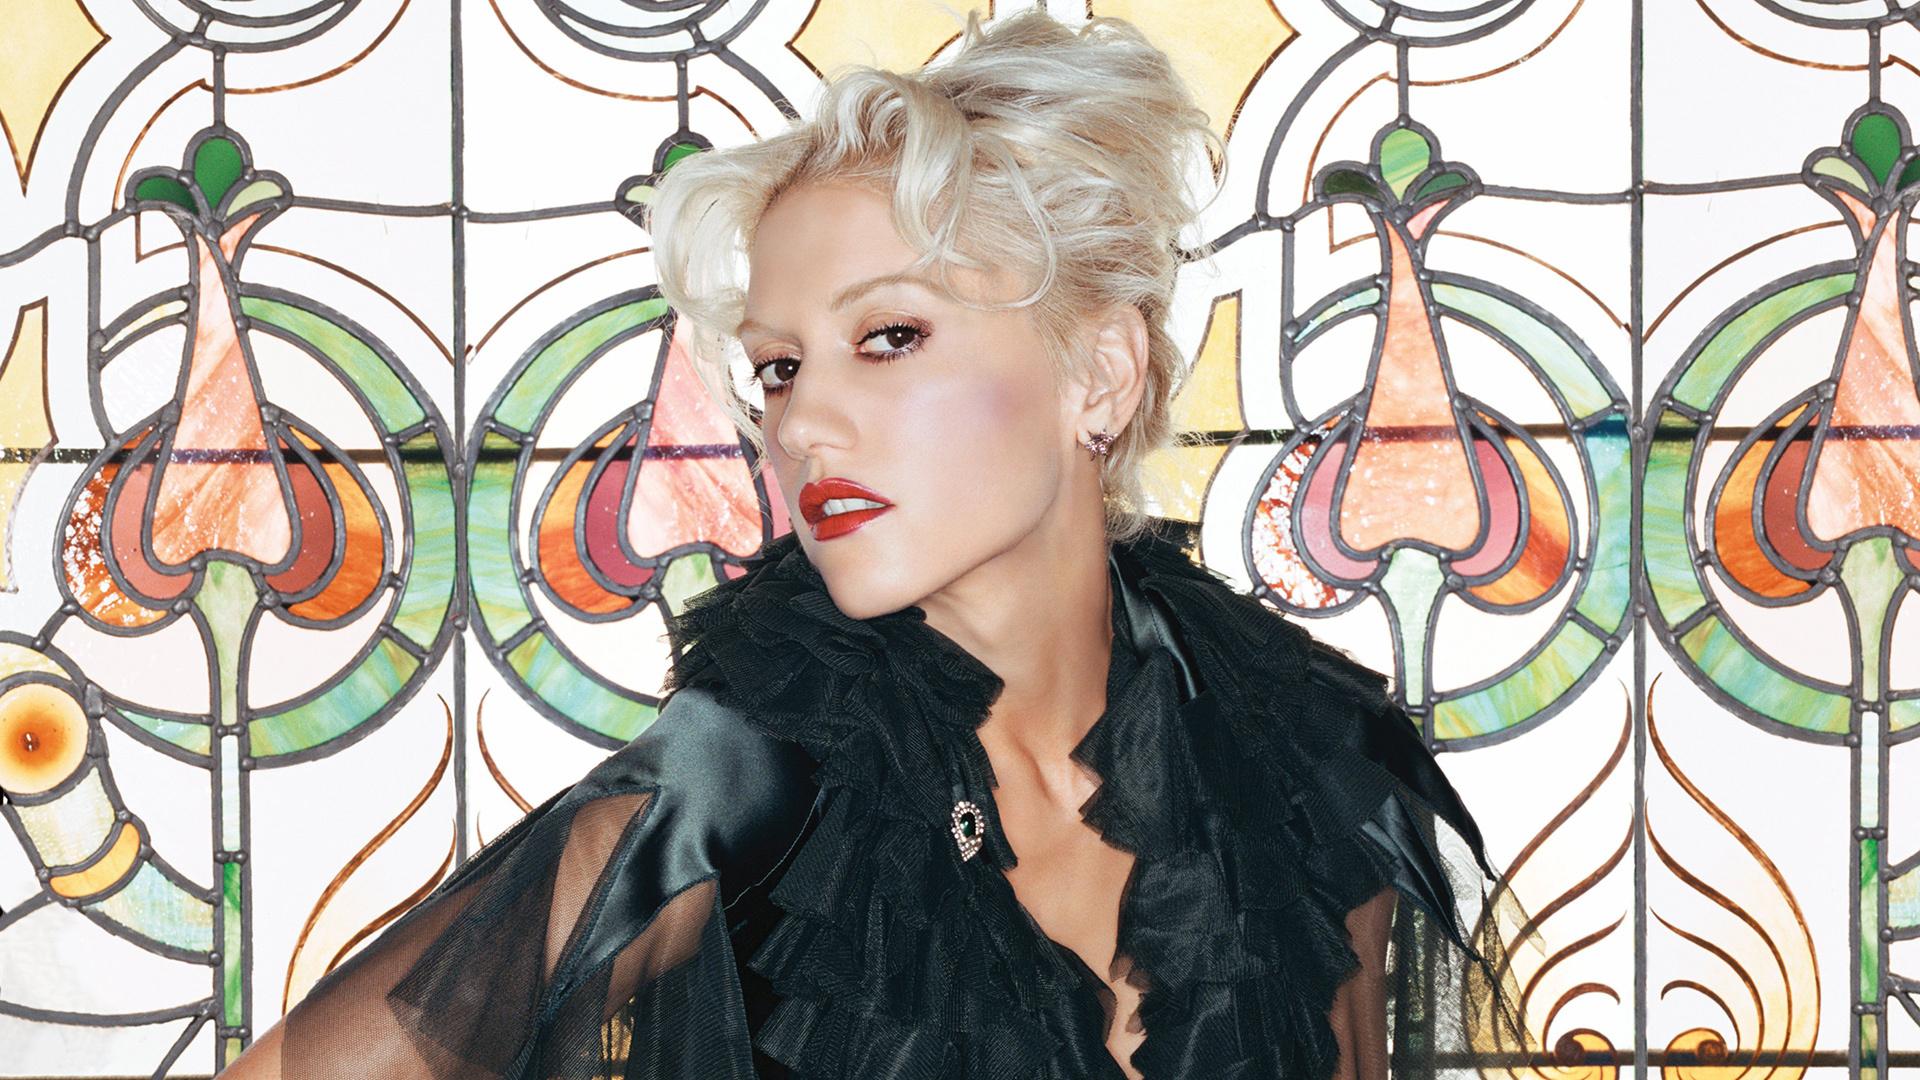 Gwen Stefani Ultra Hd Wallpaper